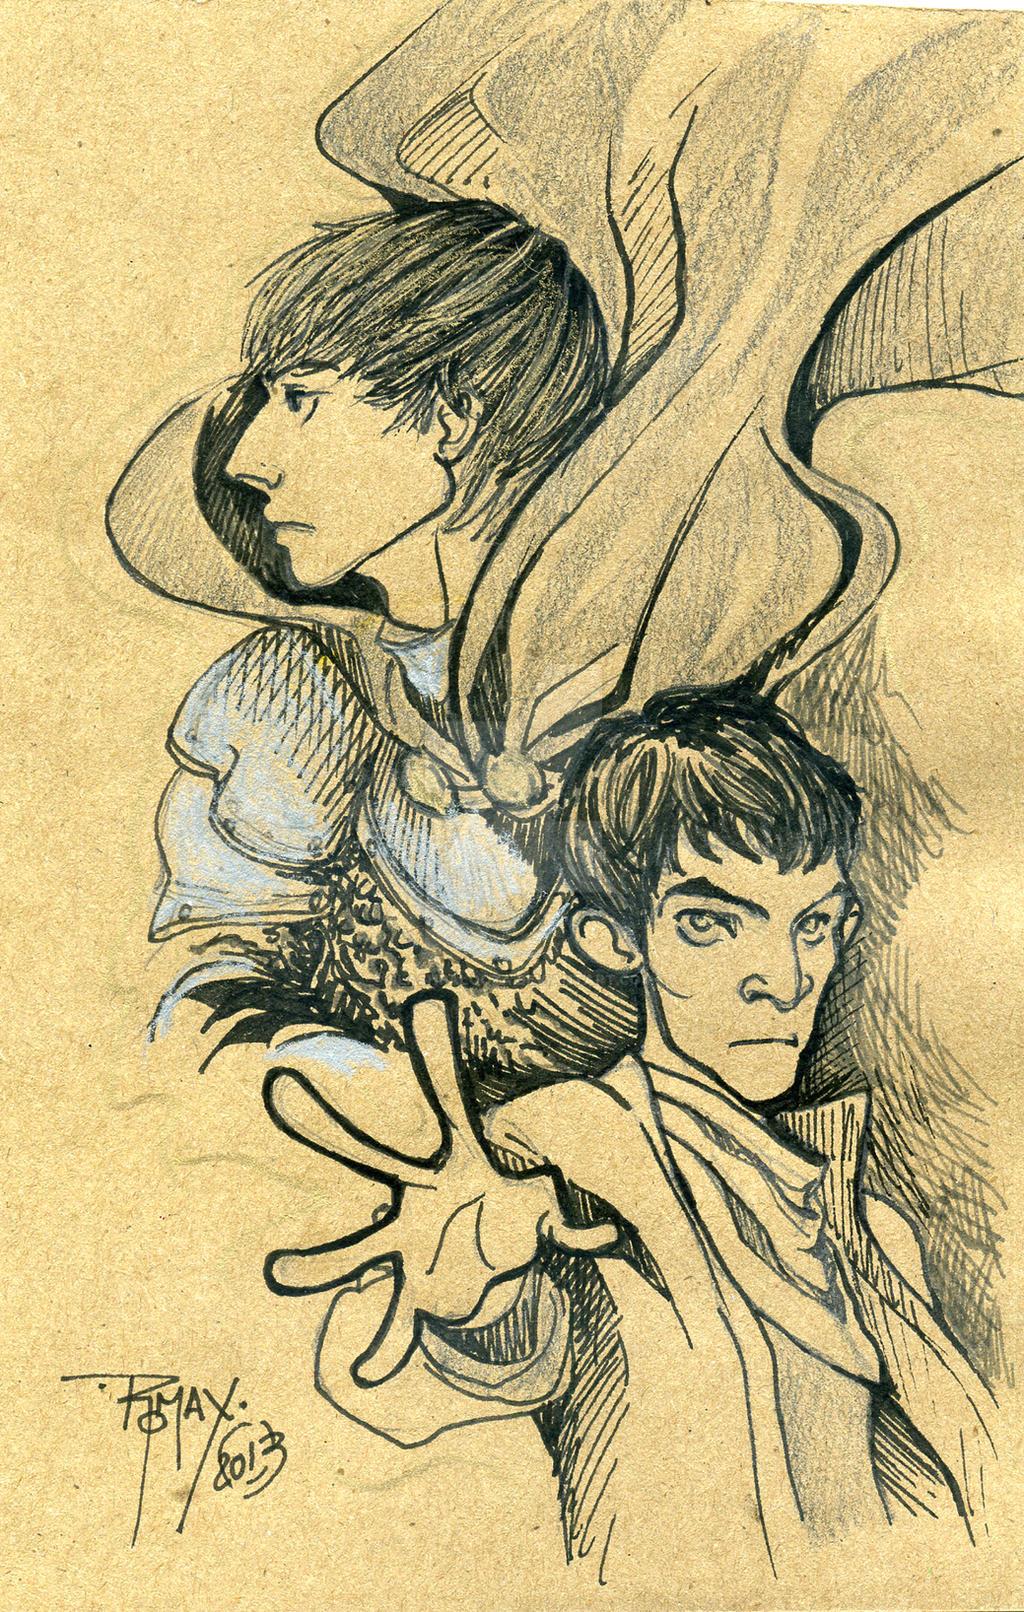 Merlin ink and pencil by Slashpalooza